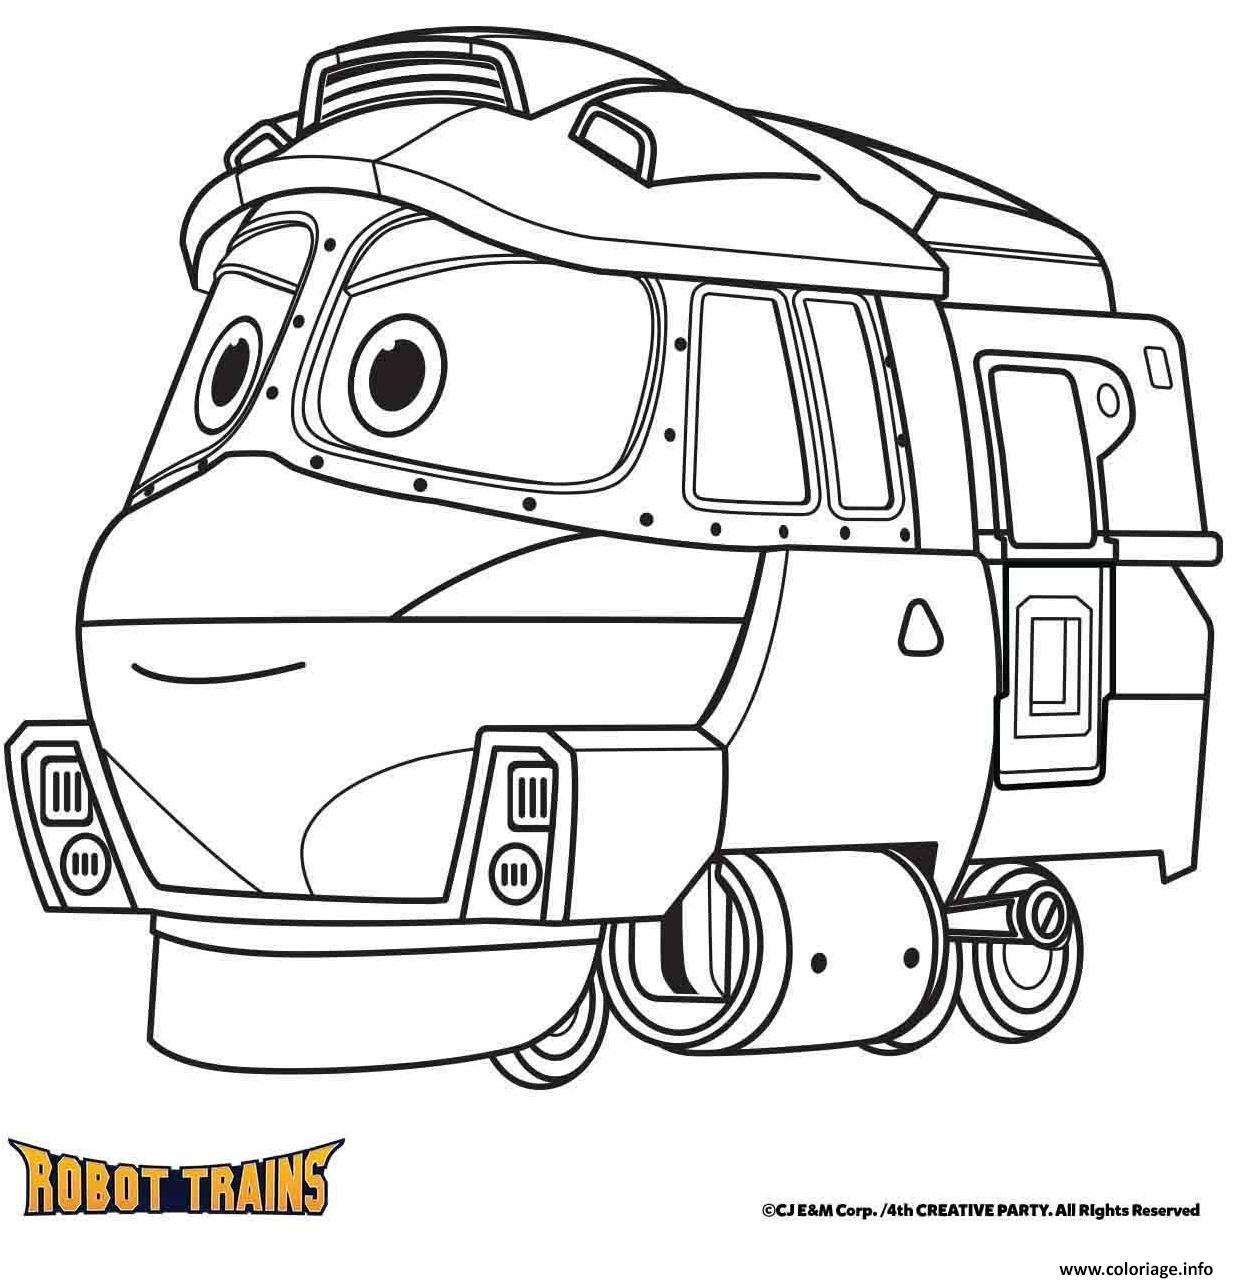 Coloriage La Locomotive Kay Robot Train Dessin Robot A Imprimer